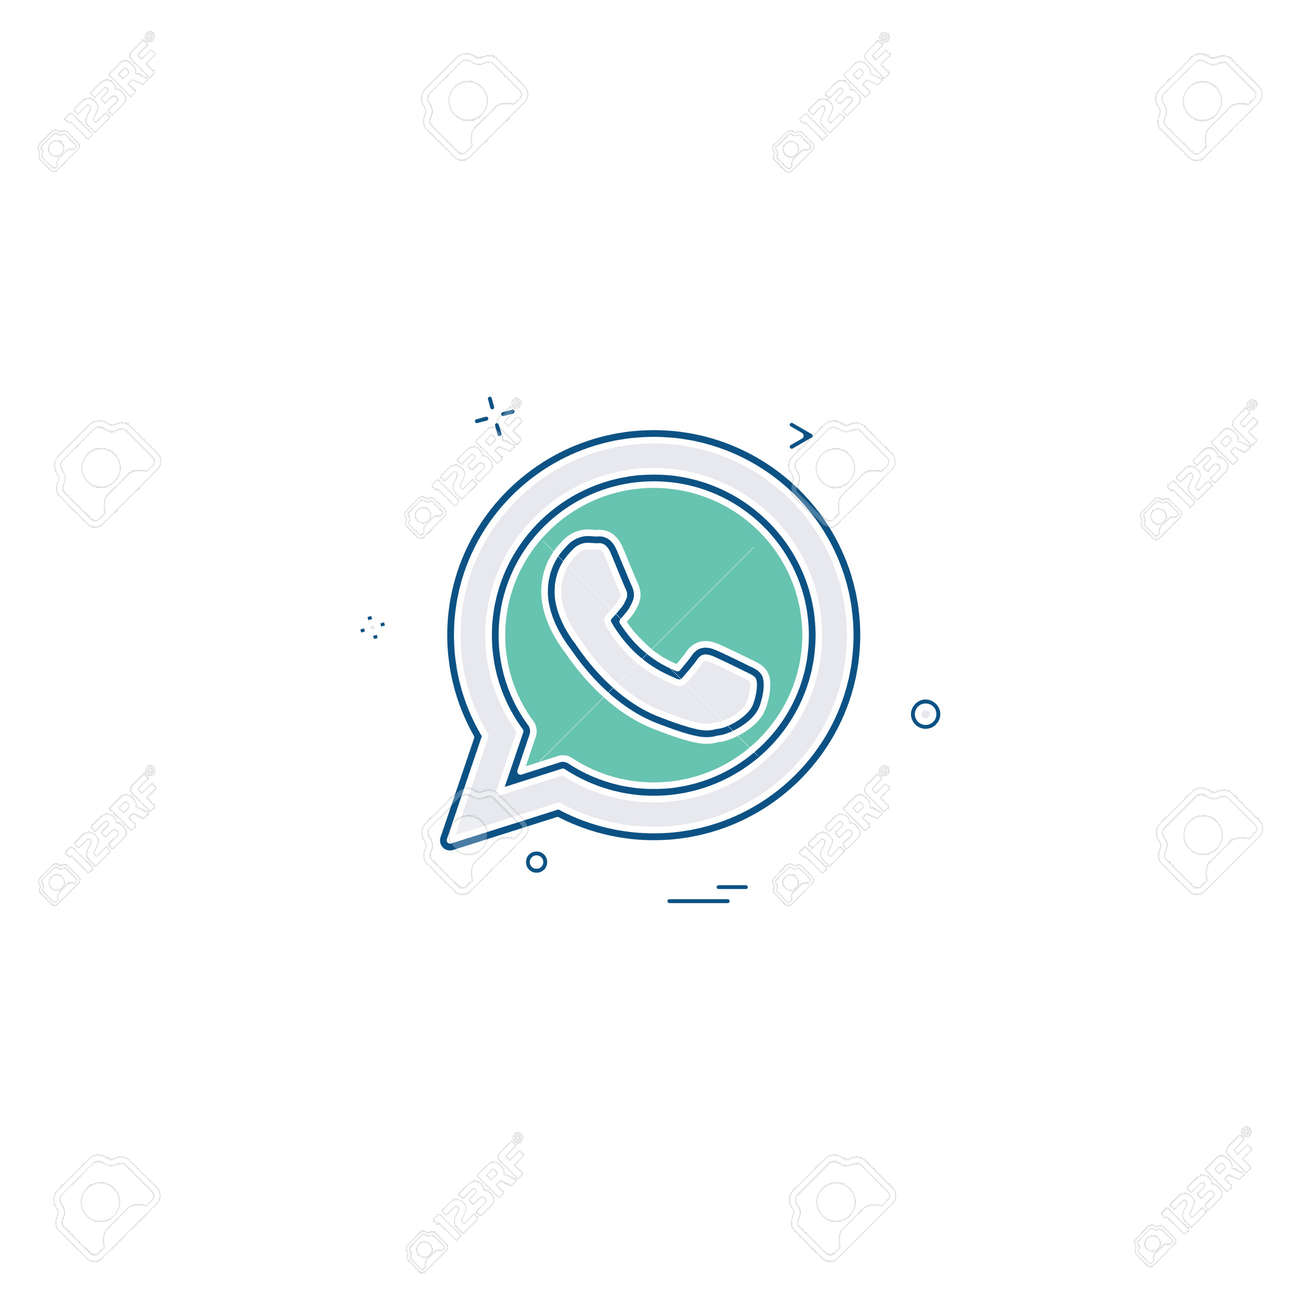 Whatsapp icon design vector - 114590591